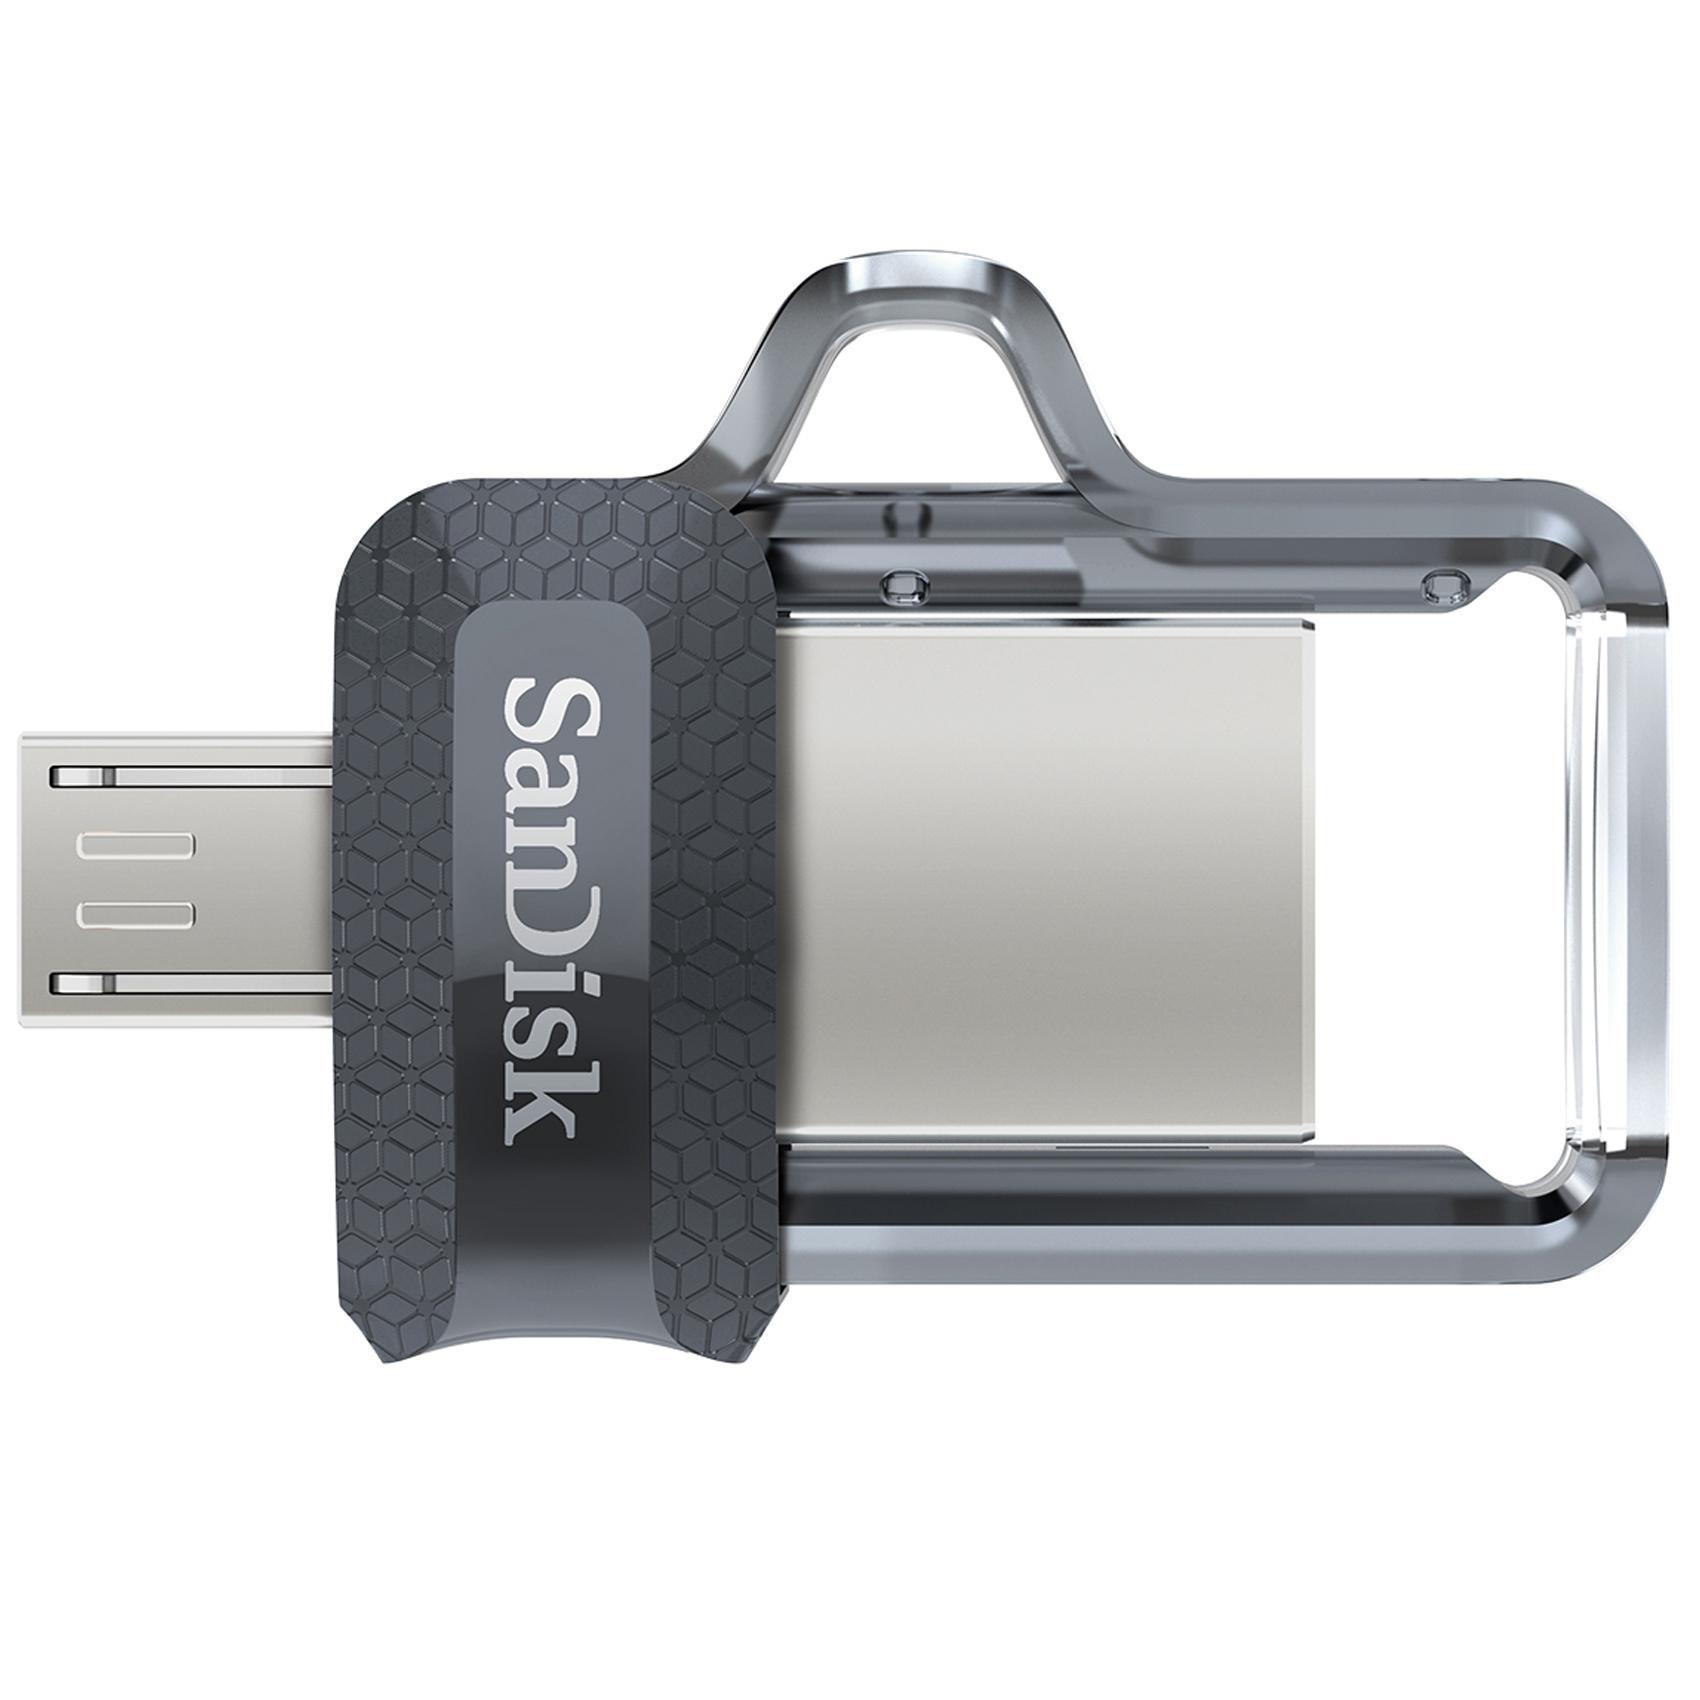 SANDISK OTG DUAL DR ULTRA 16GB 3.0